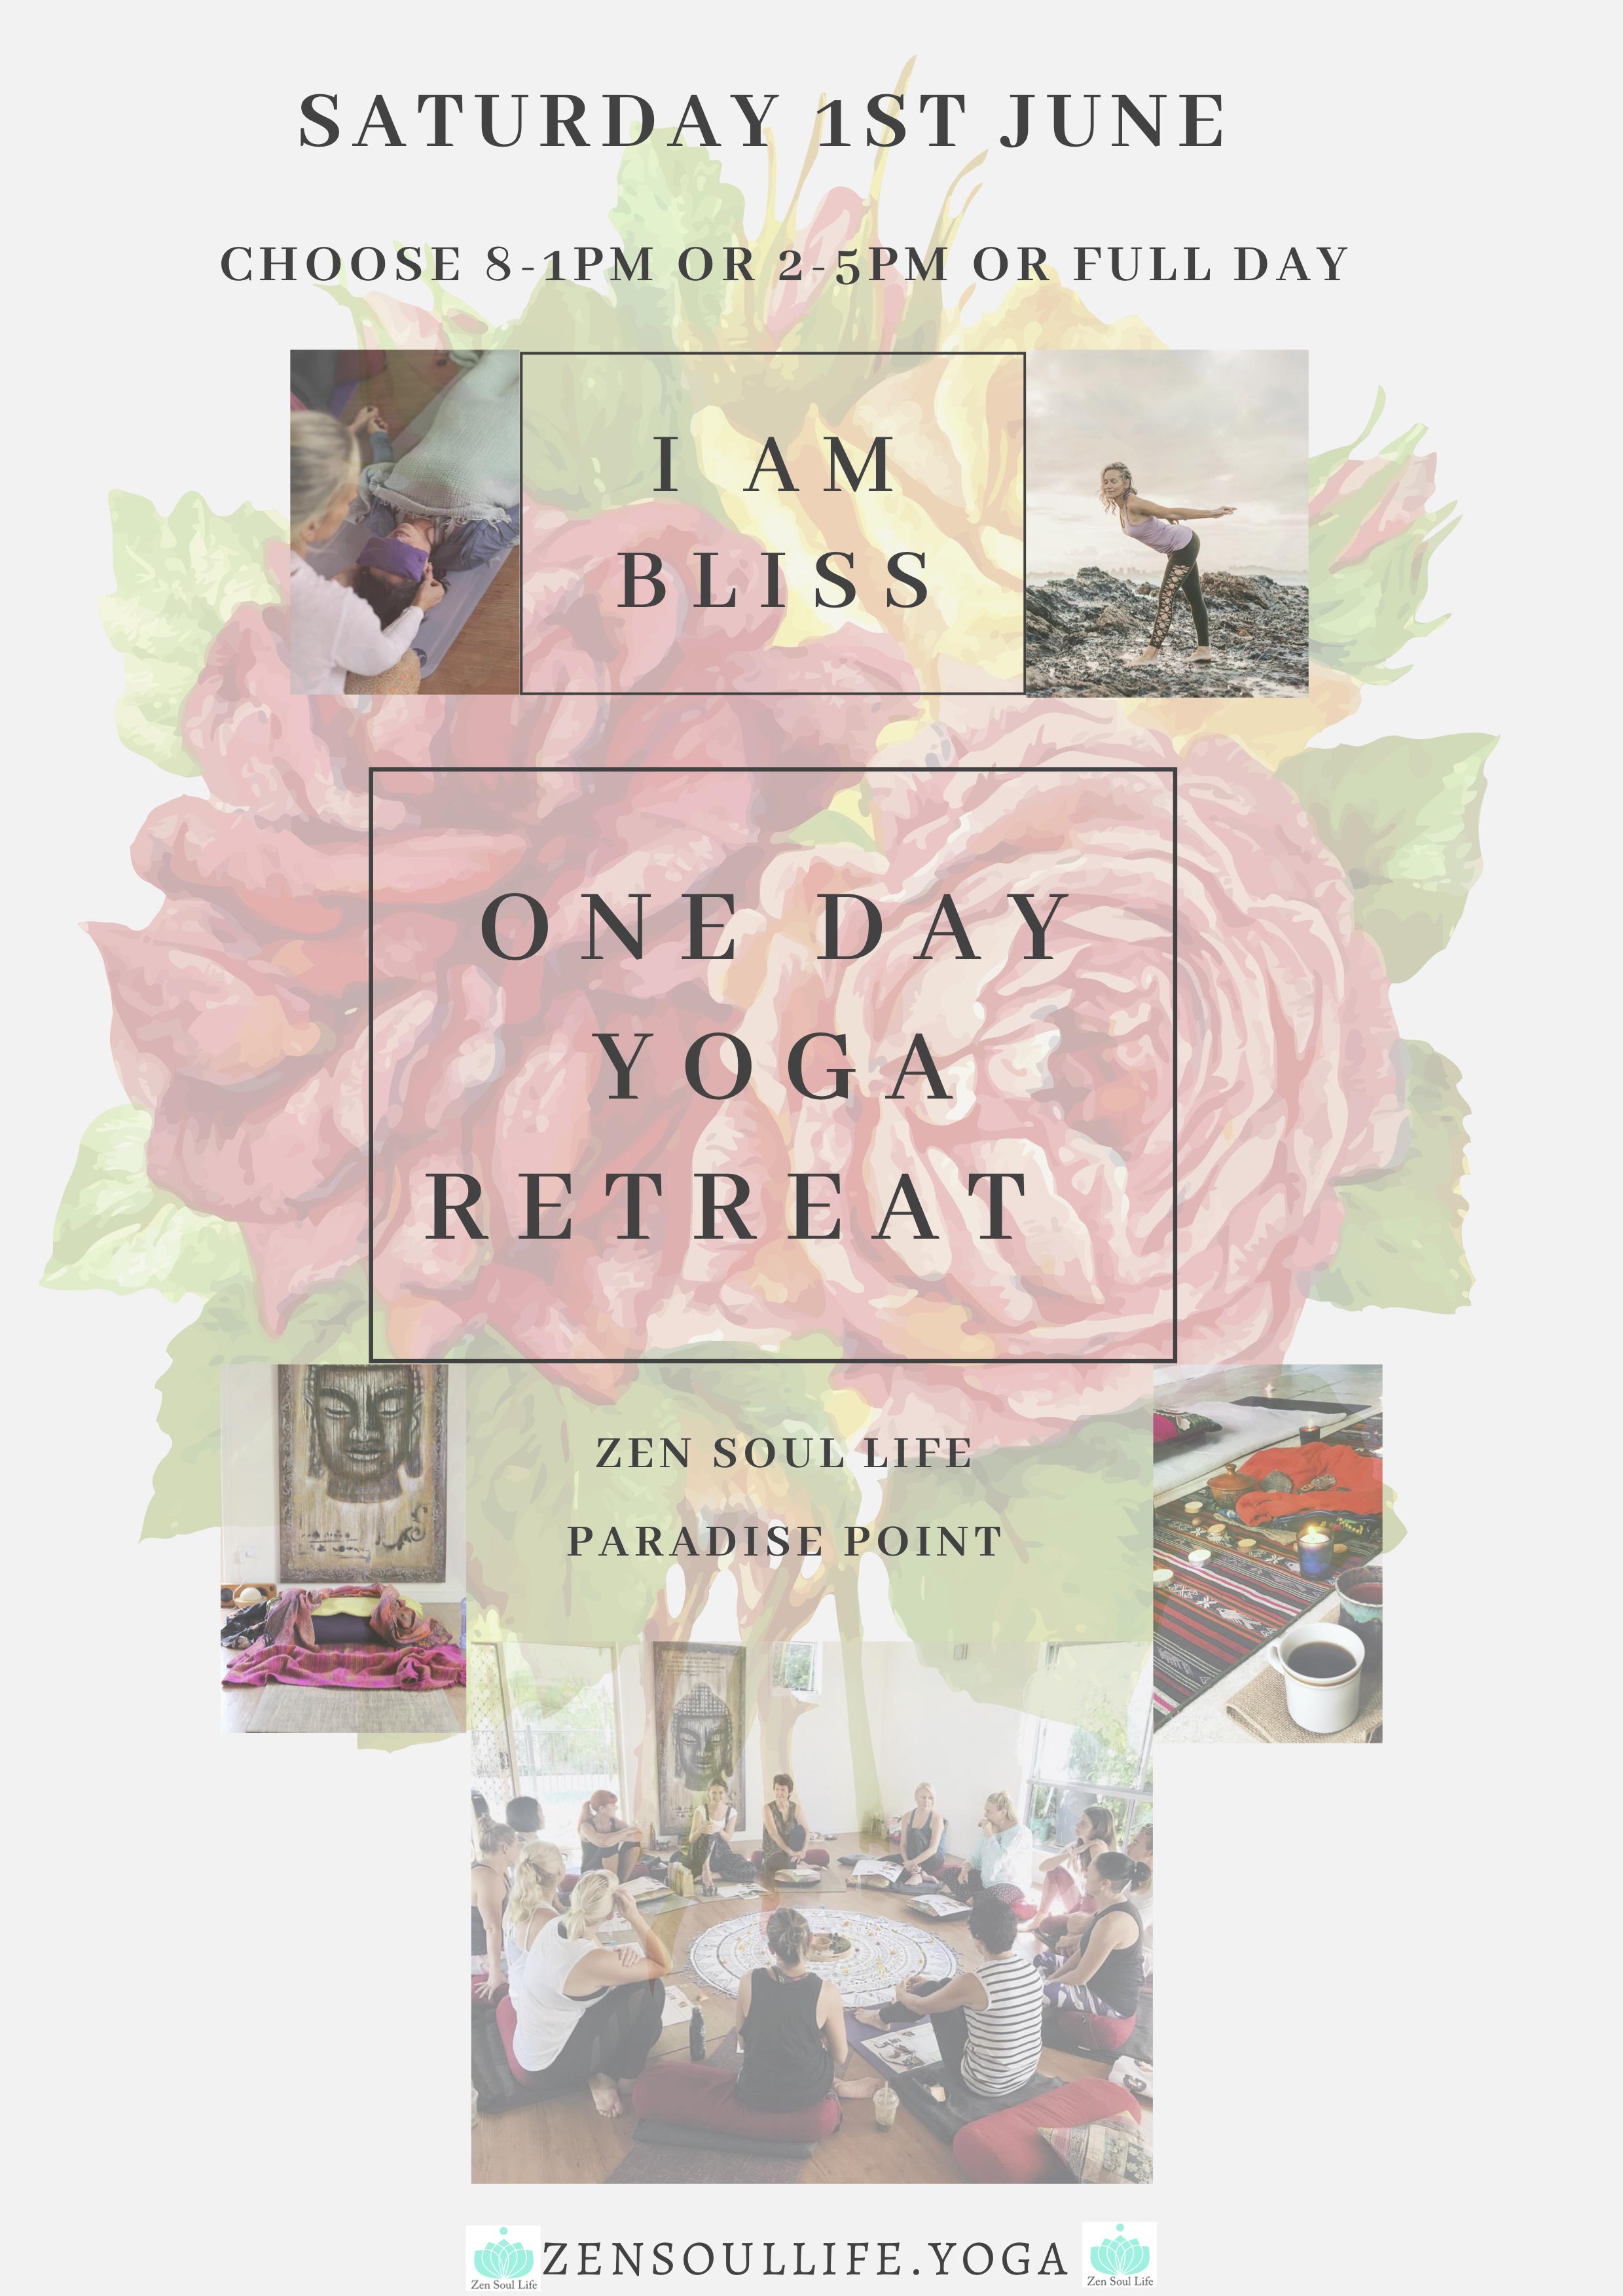 I AM BLISS One Day Retreat .jpg